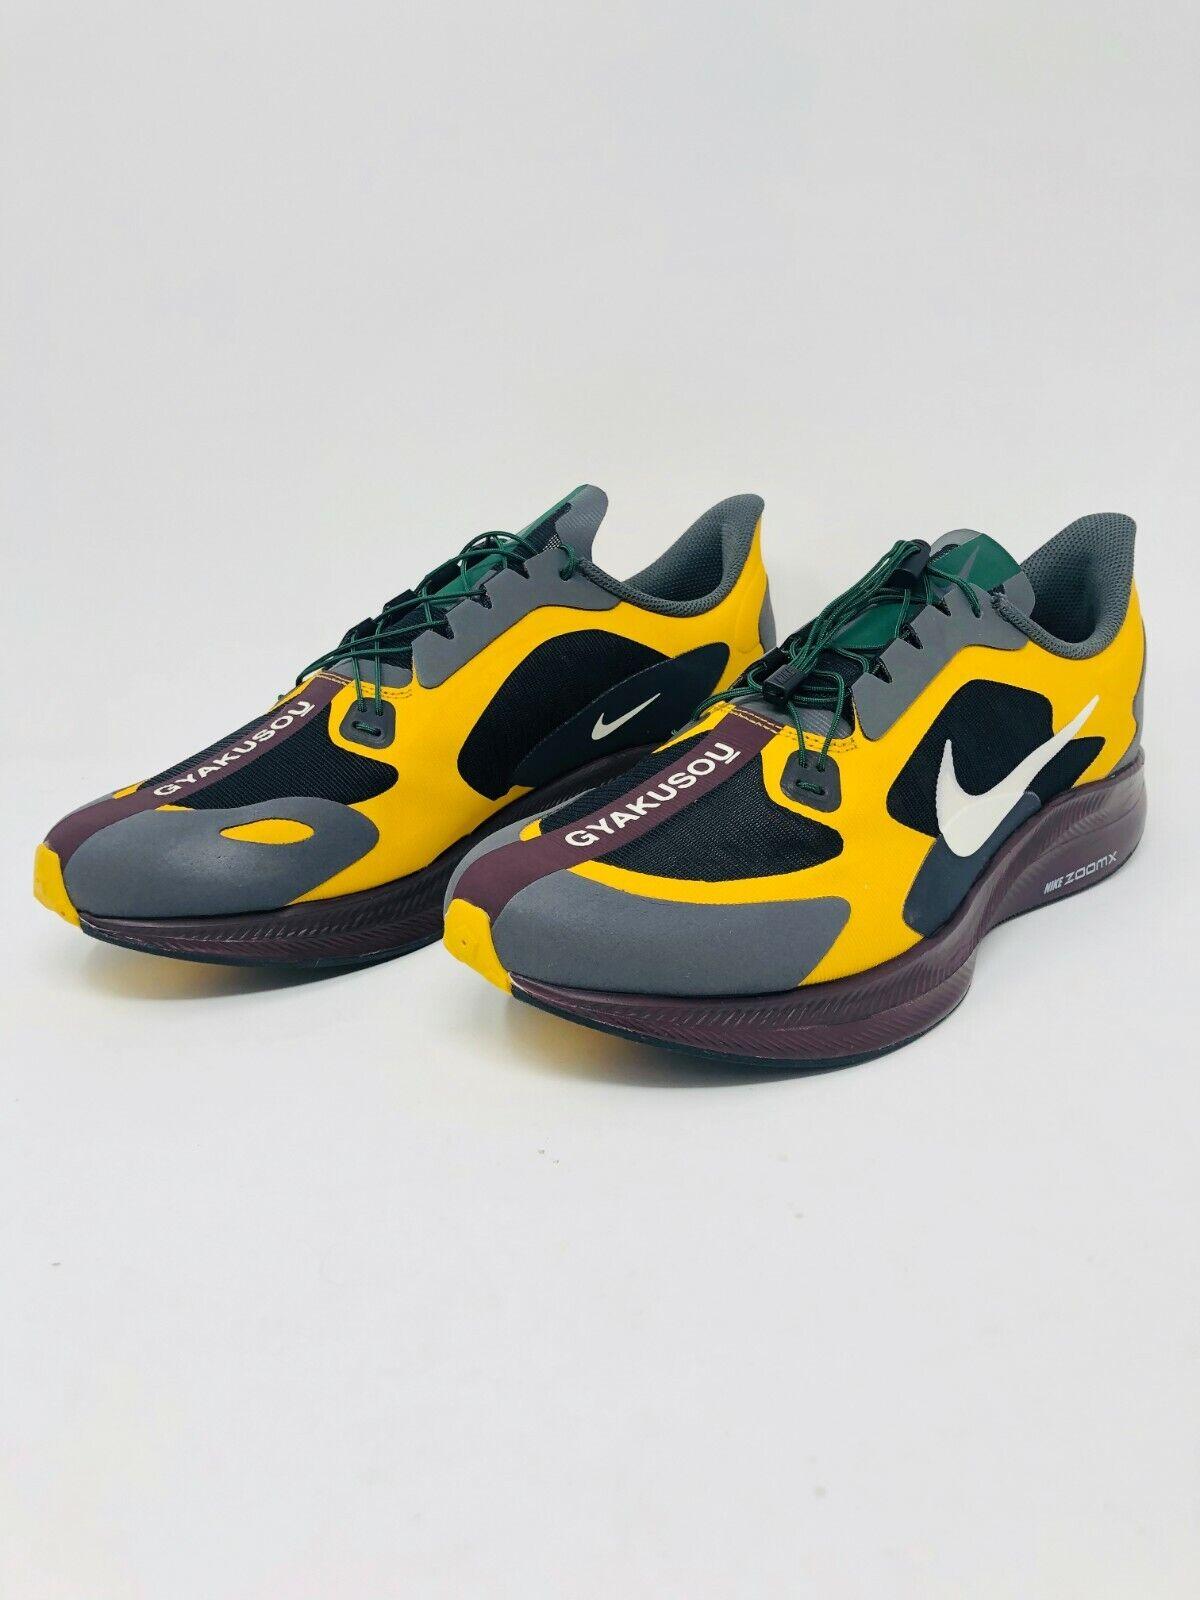 Nike Gyakusou Air Zoom Pegasus 35 Turbo Size 10 BQ0579-700 FREE SHIPPING